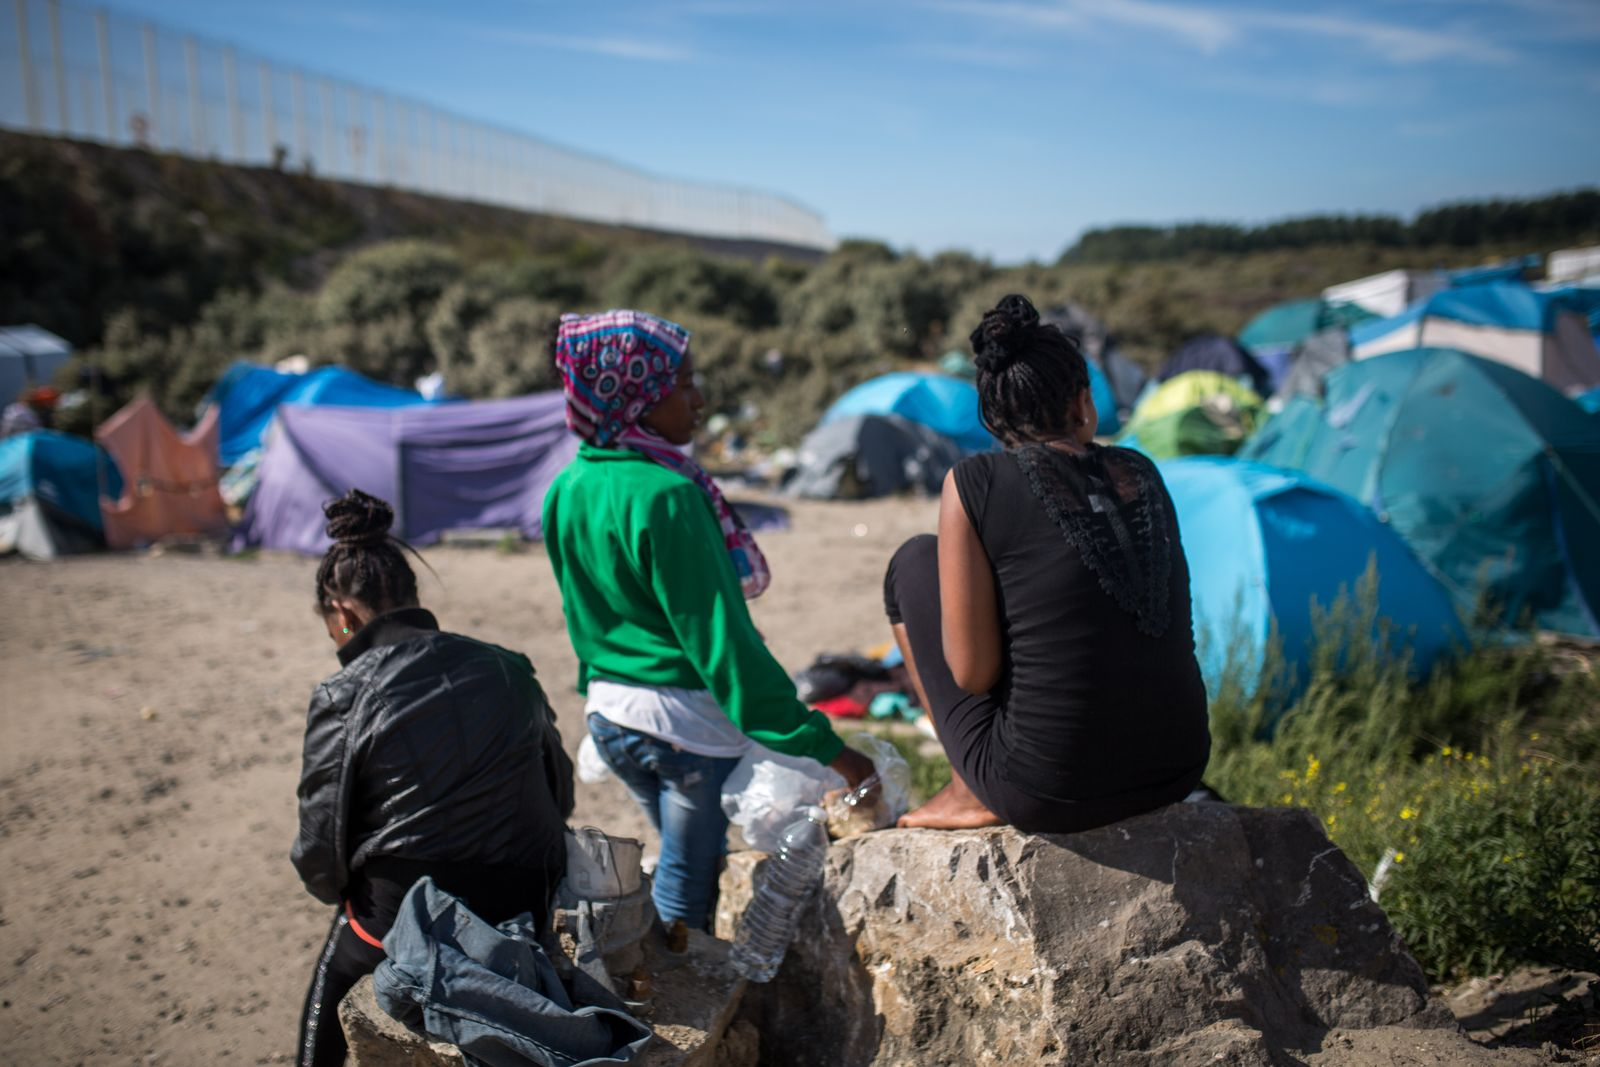 calais eurotunnel flüchtlinge